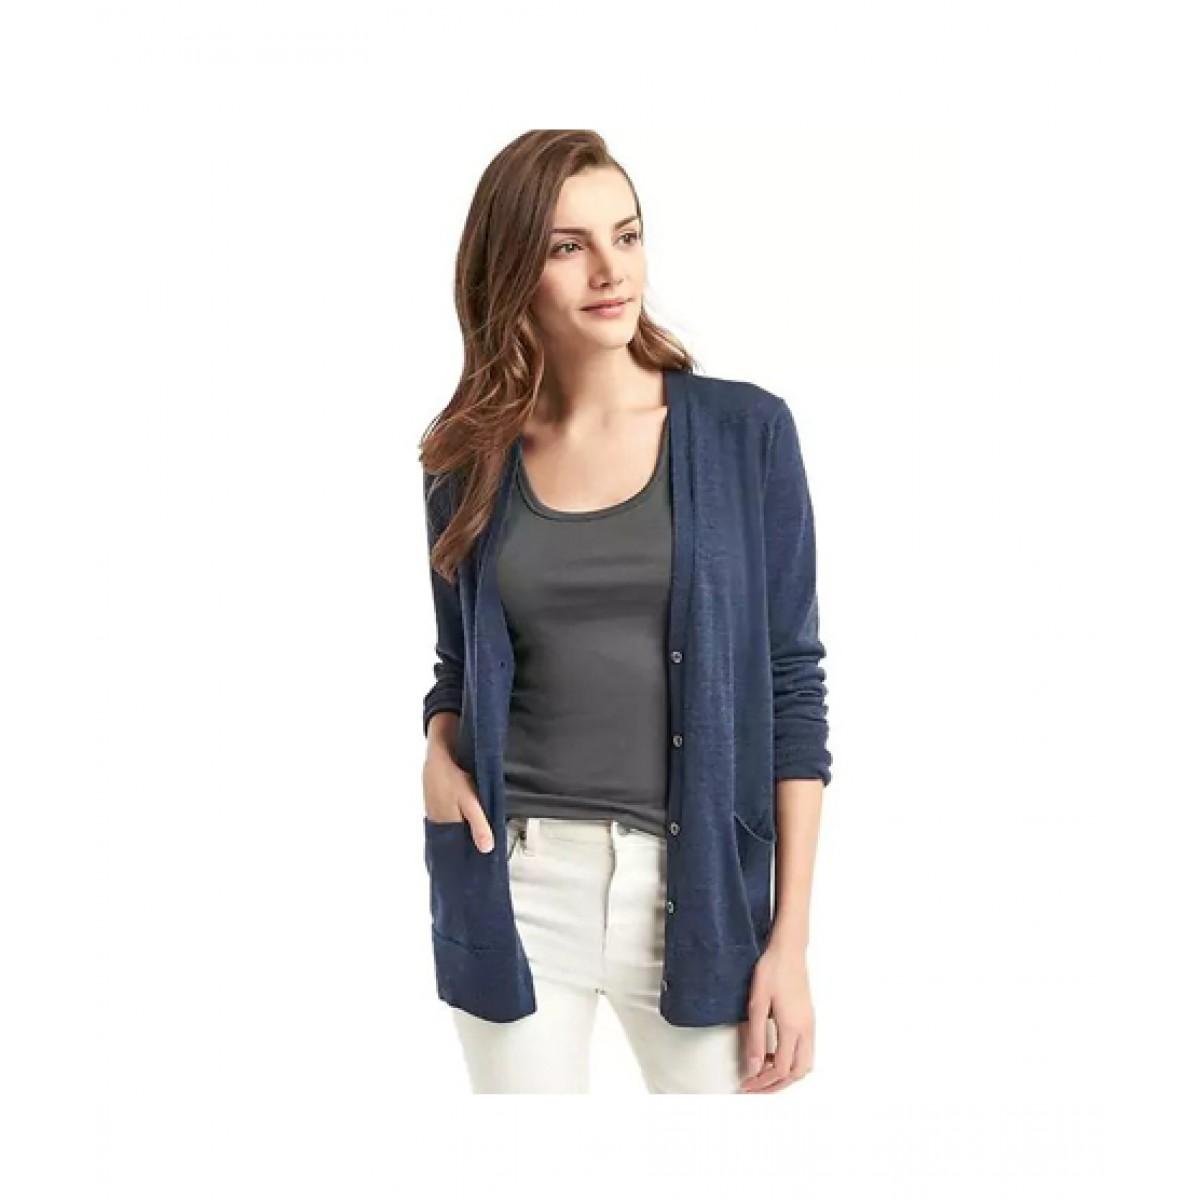 da7a6d0f4cde25 Gap Wool Cardigan Women's Sweater Price in Pakistan   Buy Gap Merino Sweater  Indigo   iShopping.pk